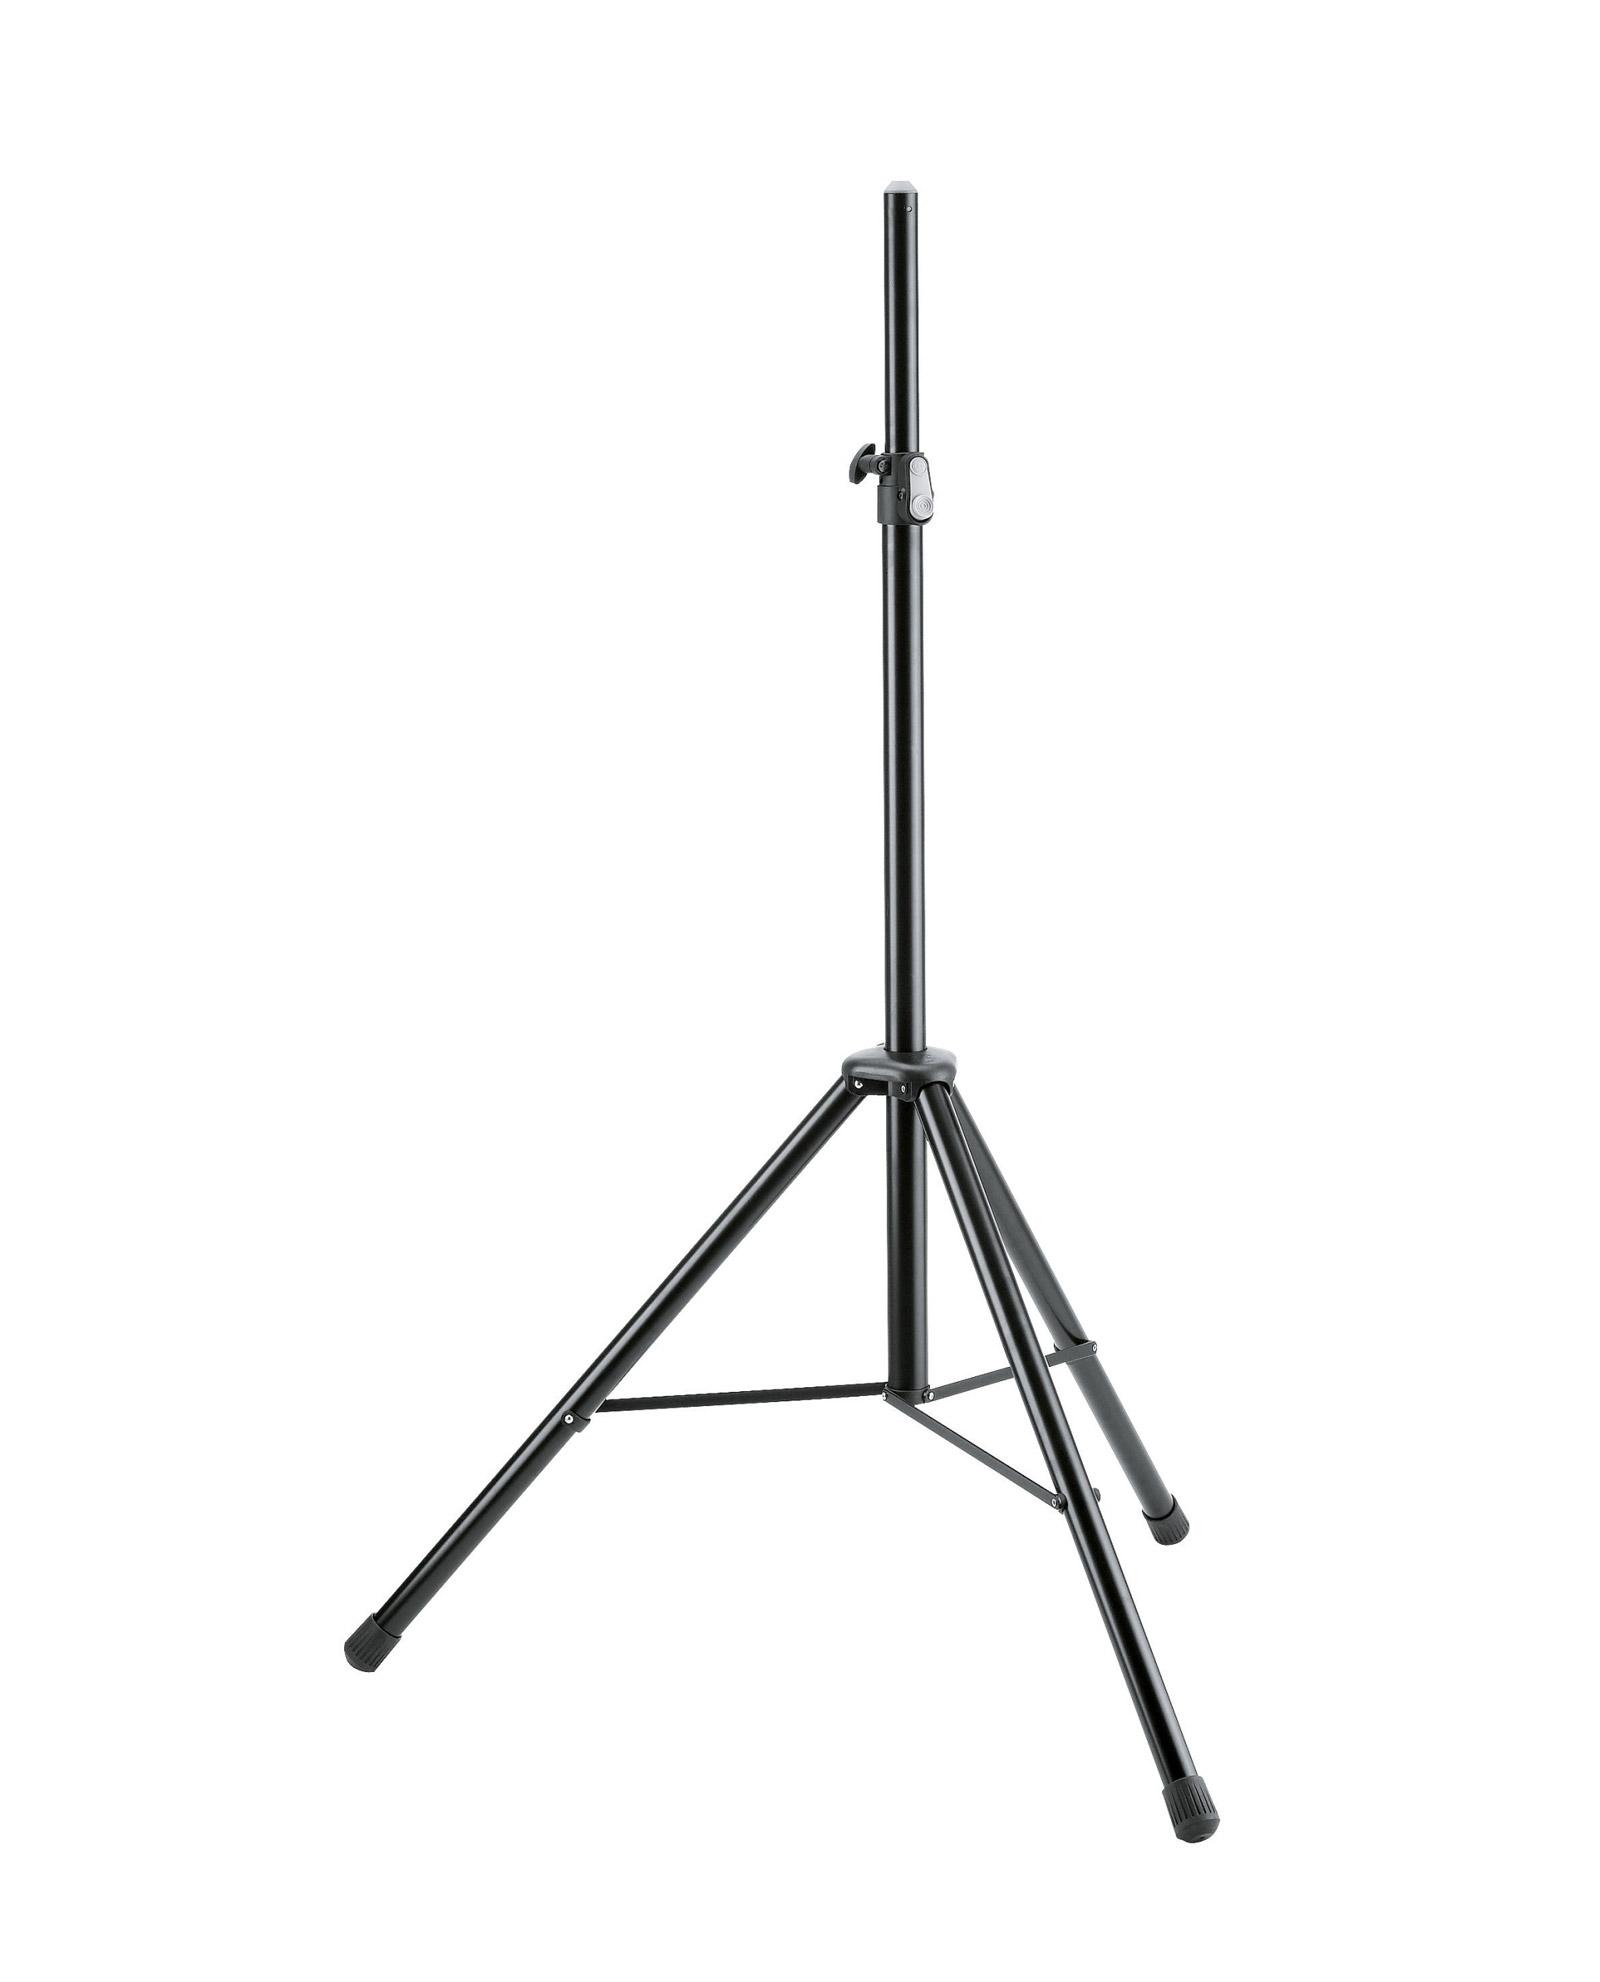 K&m 21436 Speaker Stand